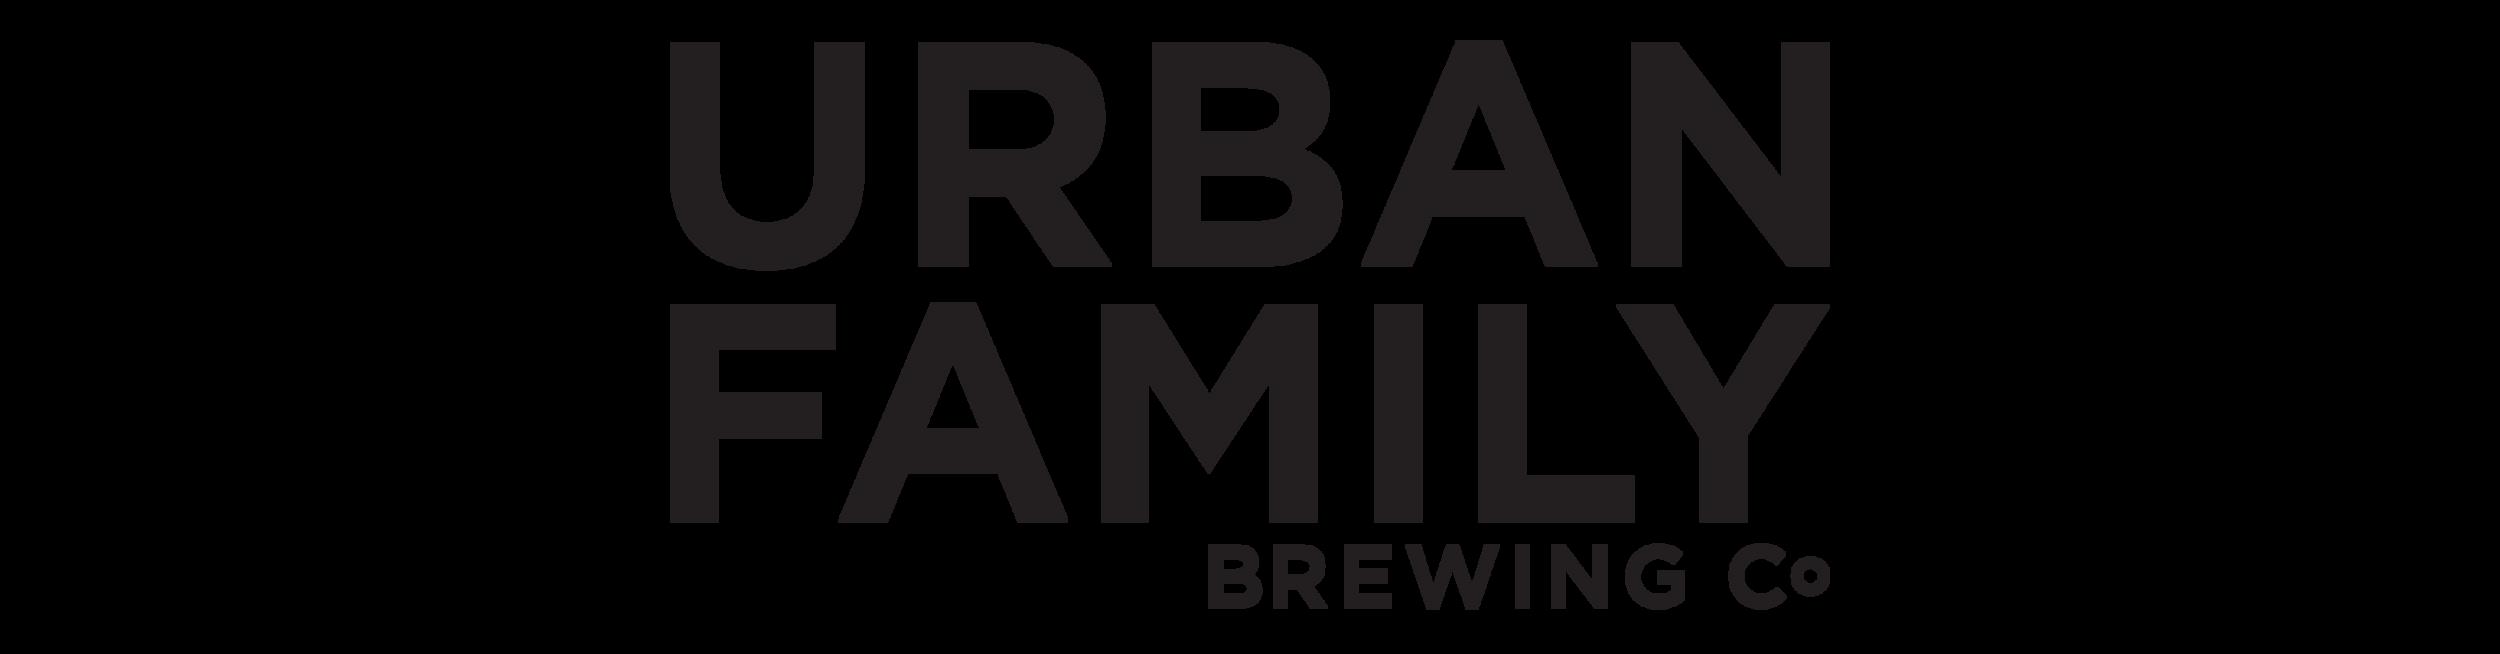 urbanfamily_oktoberfest.png